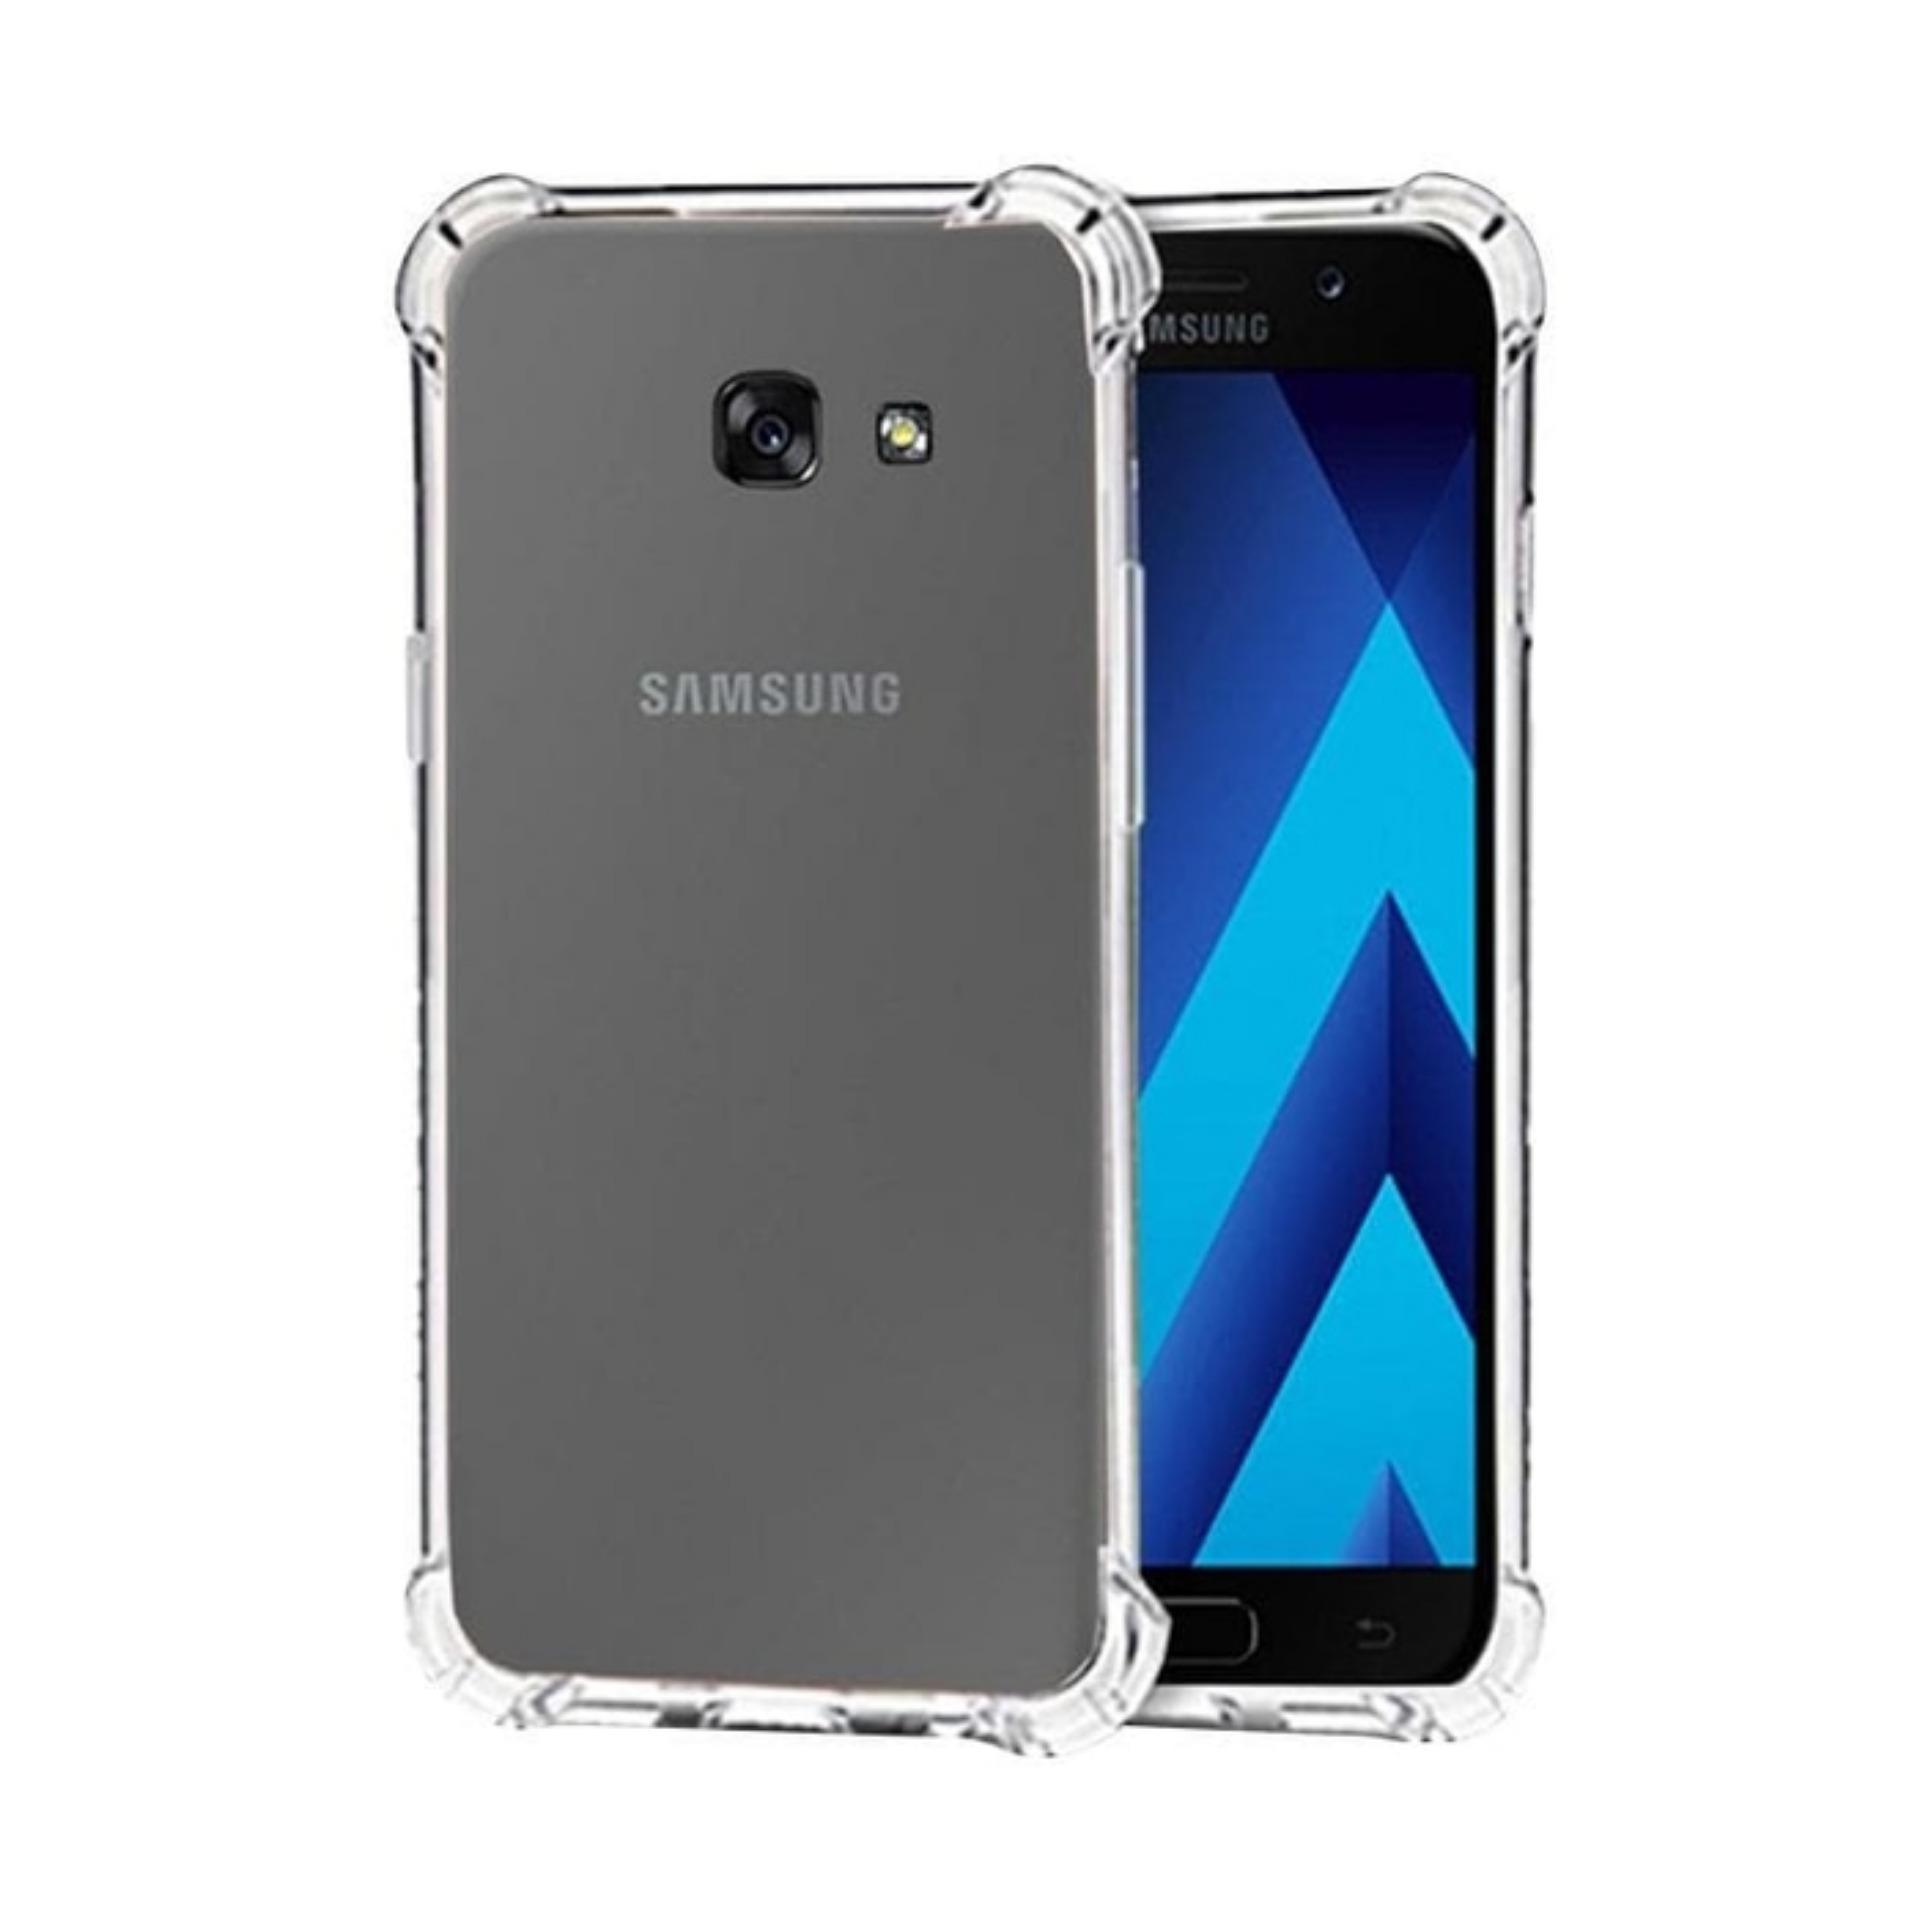 Case Michellisto Samsung A310 A3 2016 Anti Crack Shock Case Back Cover TPU Silicone fuze Clear